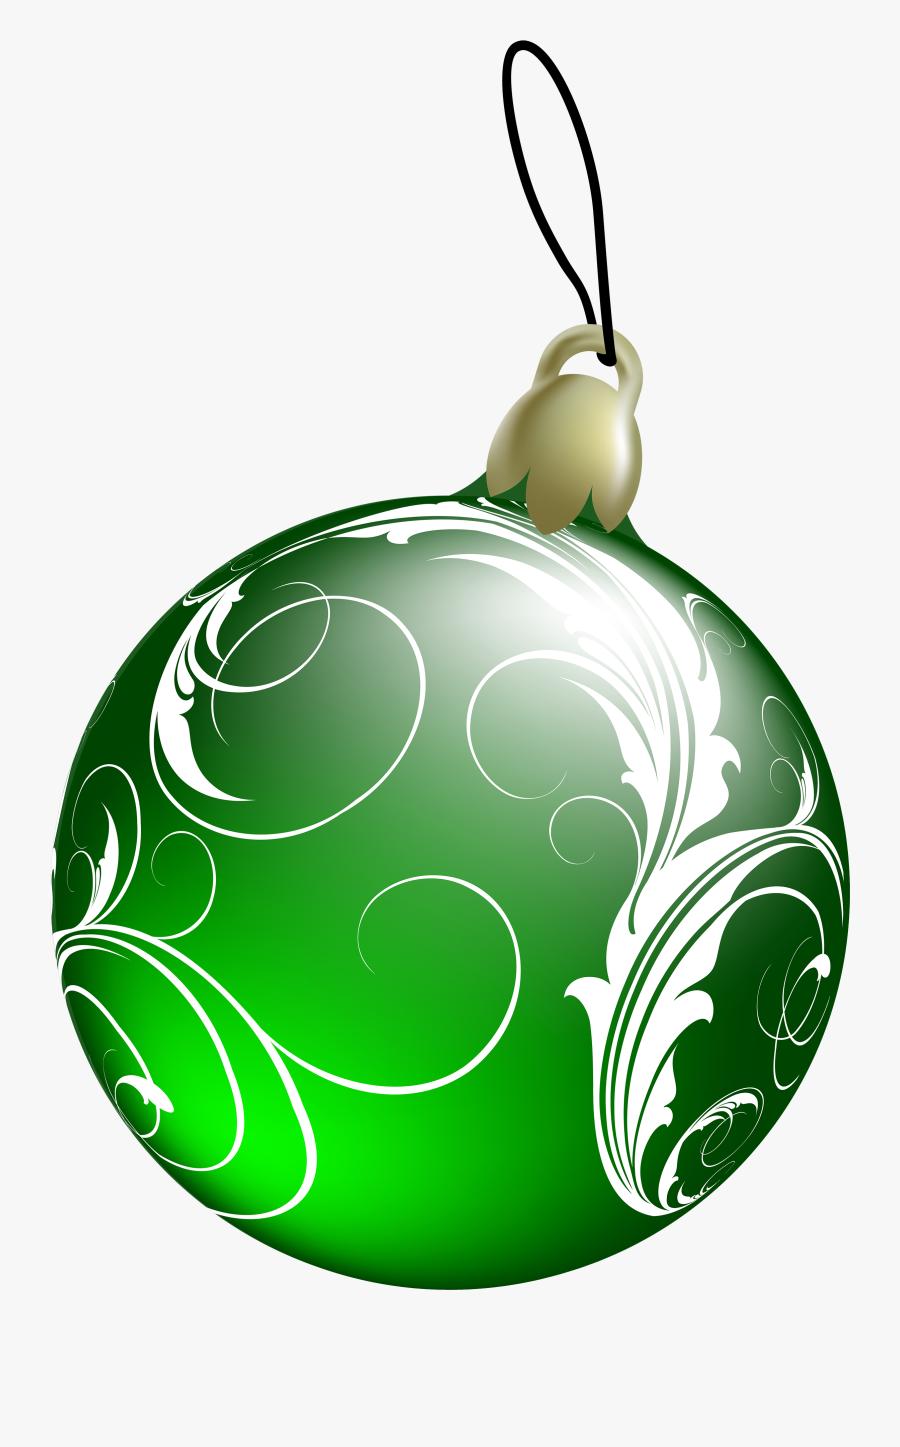 Beautiful Green Christmas Ball Png Clipart - Green Christmas Balls Transparent, Transparent Clipart